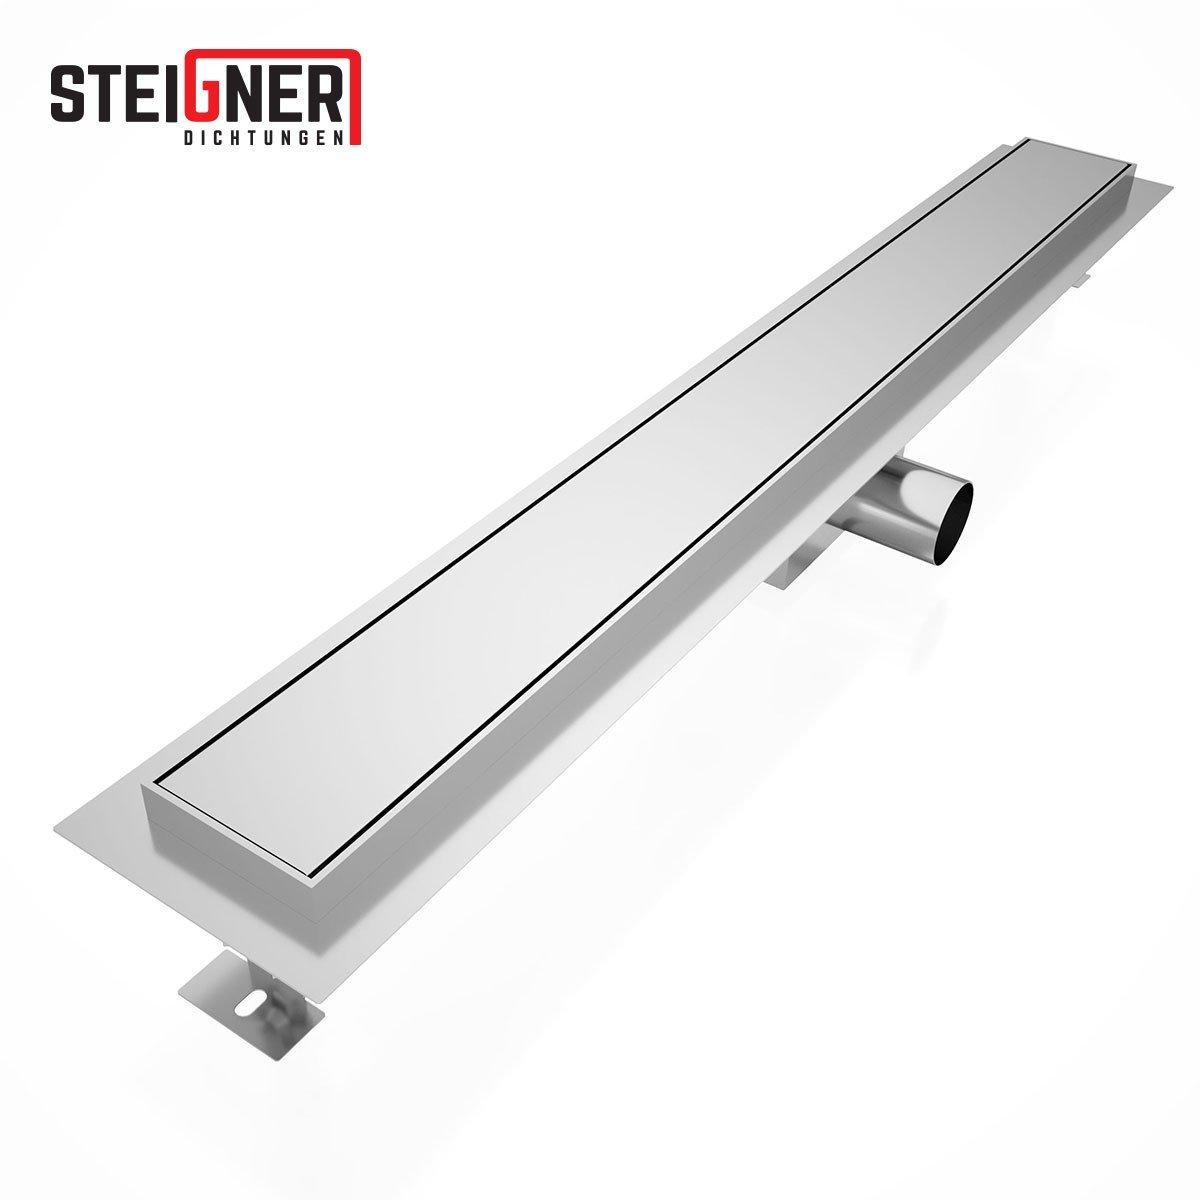 Steigner Amsterdam SDR90 - Desagü e de ducha, de acero inoxidable SDR90, 100 cm, 1 pieza 100cm 1pieza 52819074